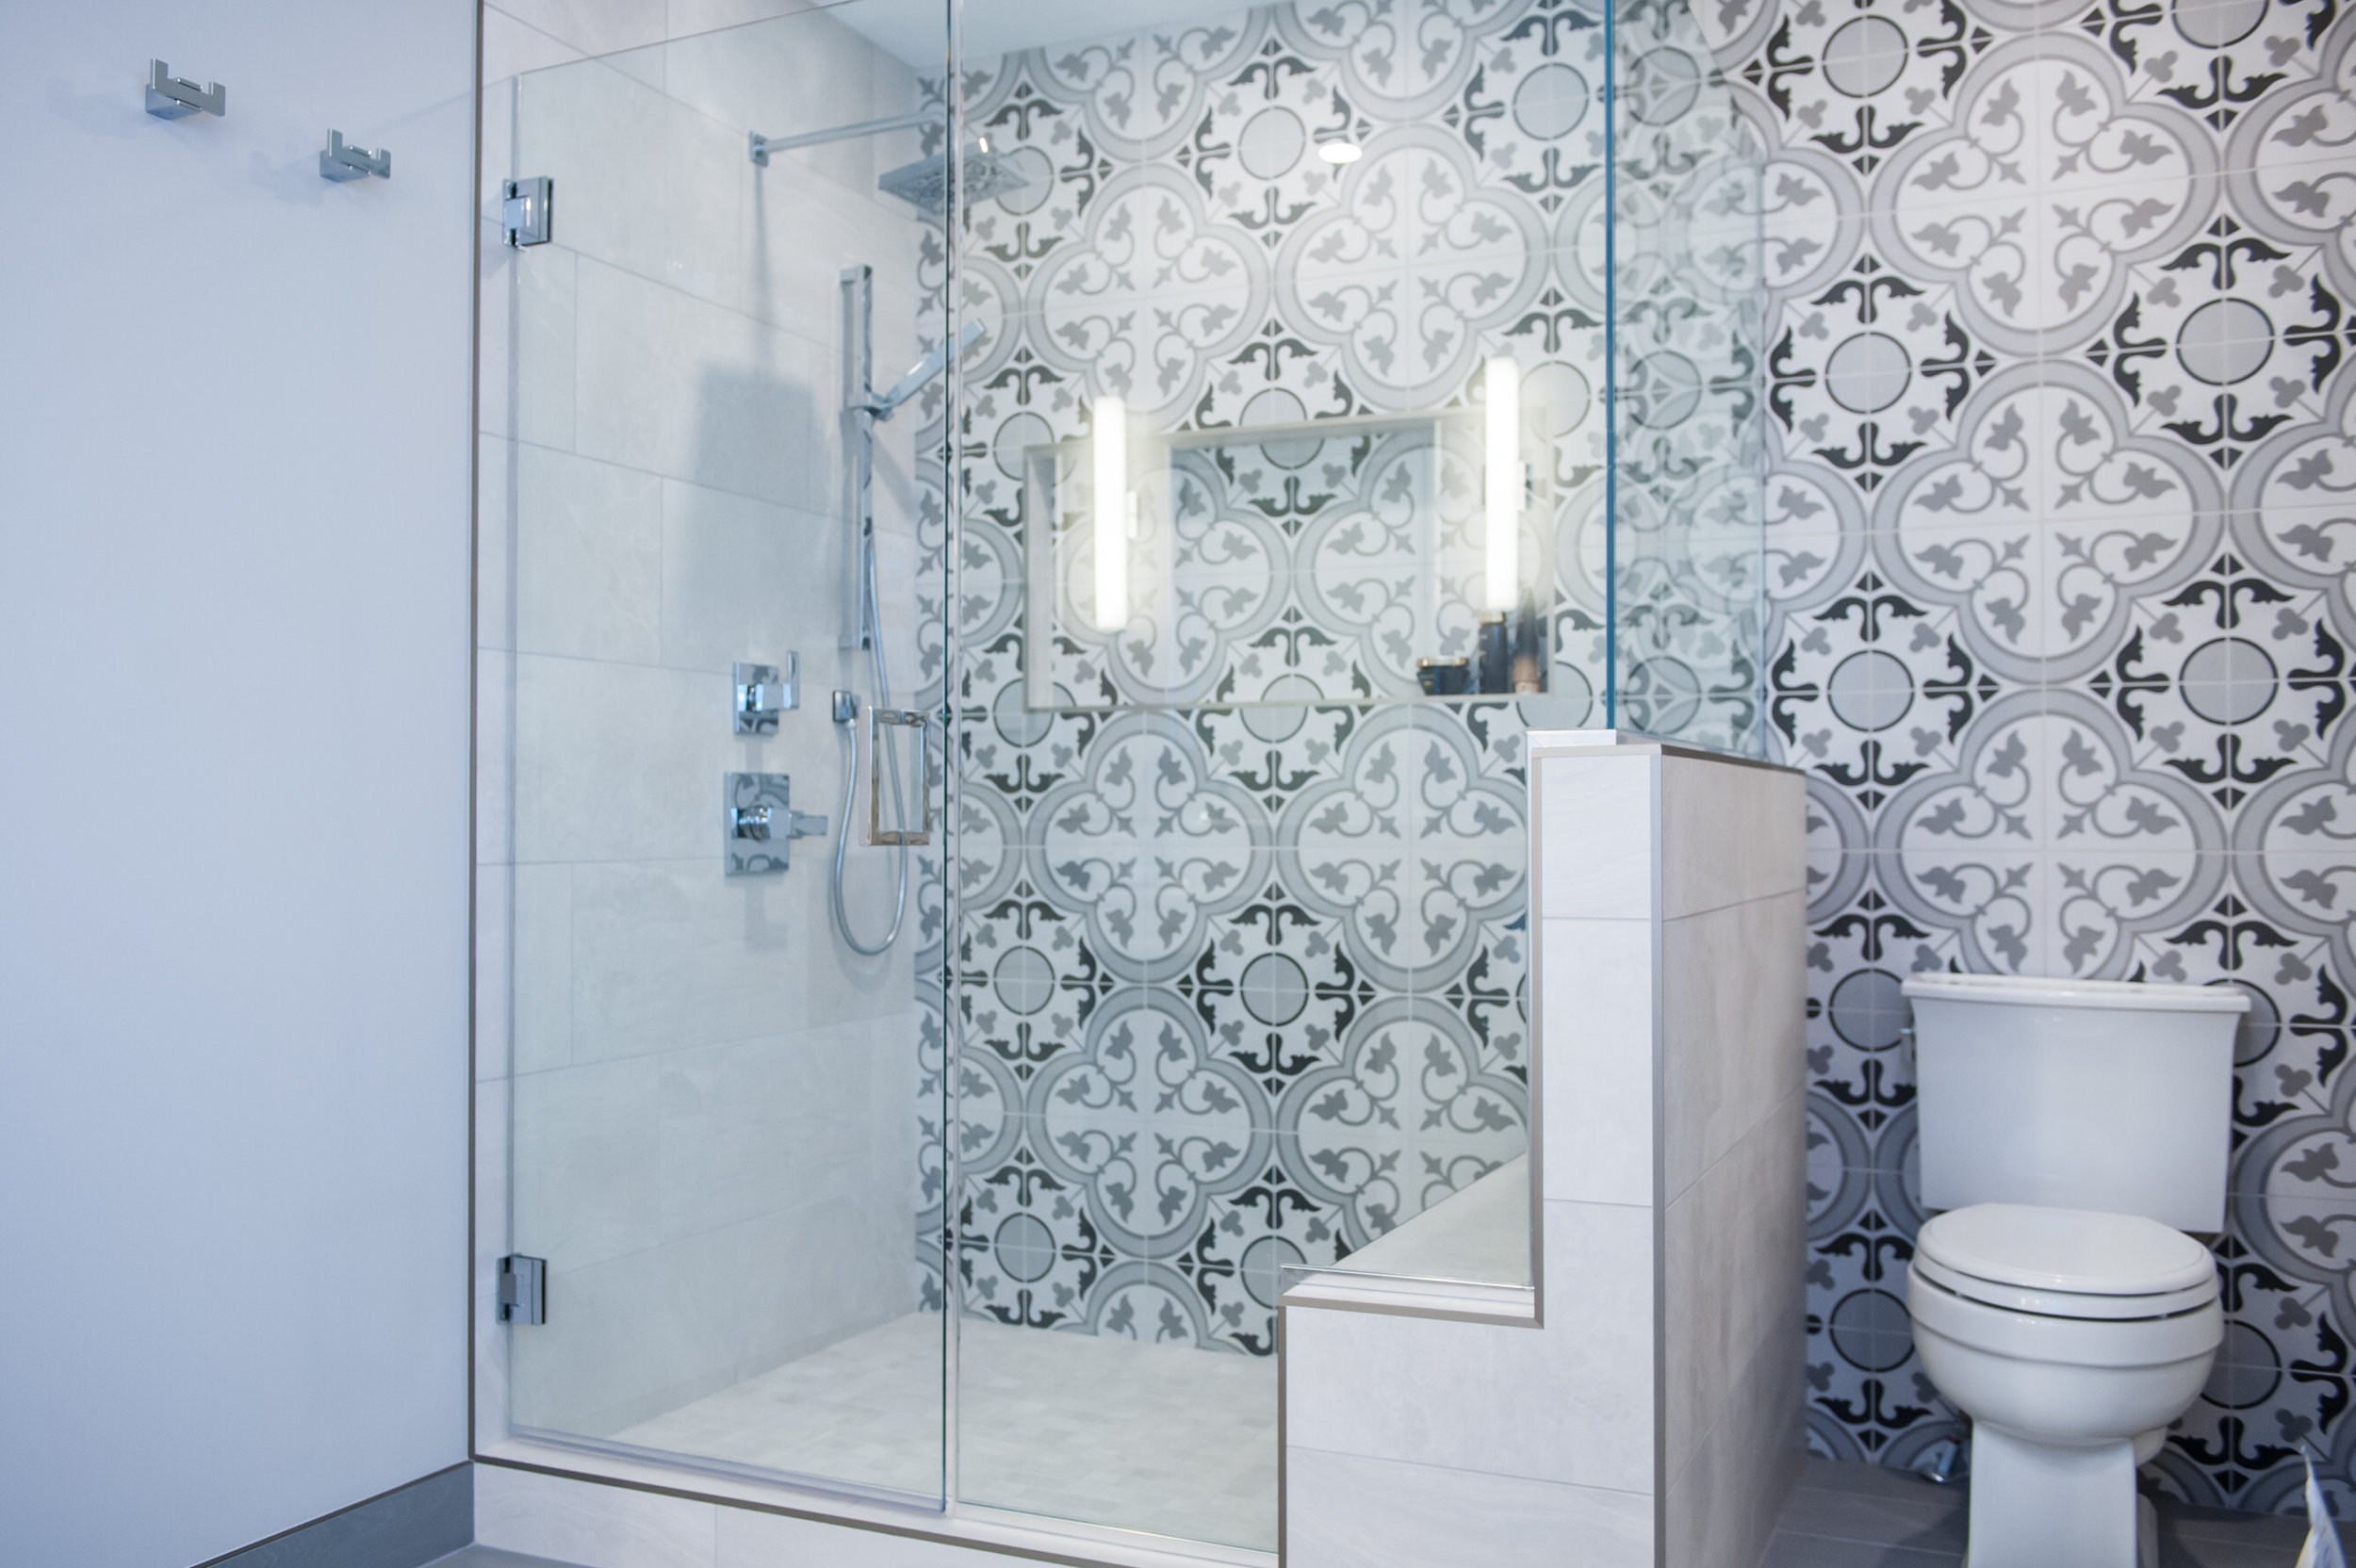 Mosaic_shower_